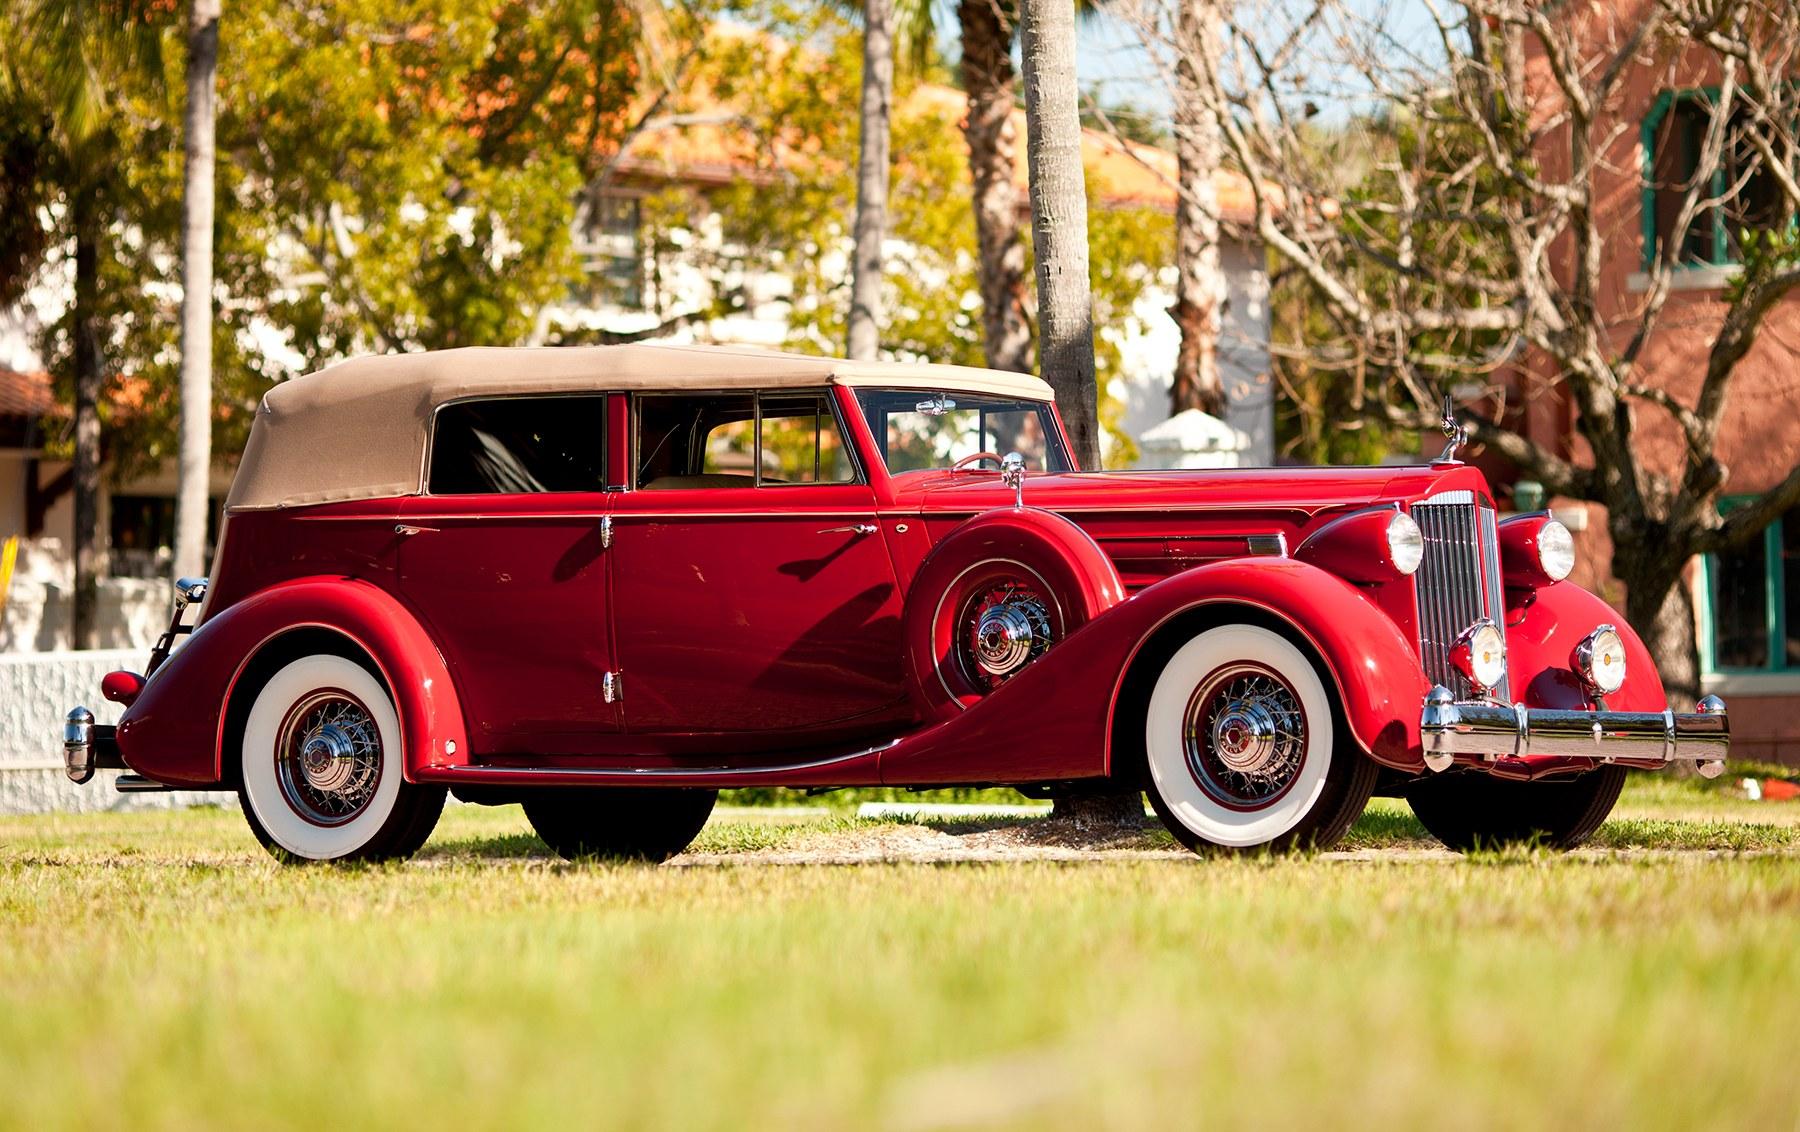 1935 Packard Twelve Model 1208 Convertible Sedan